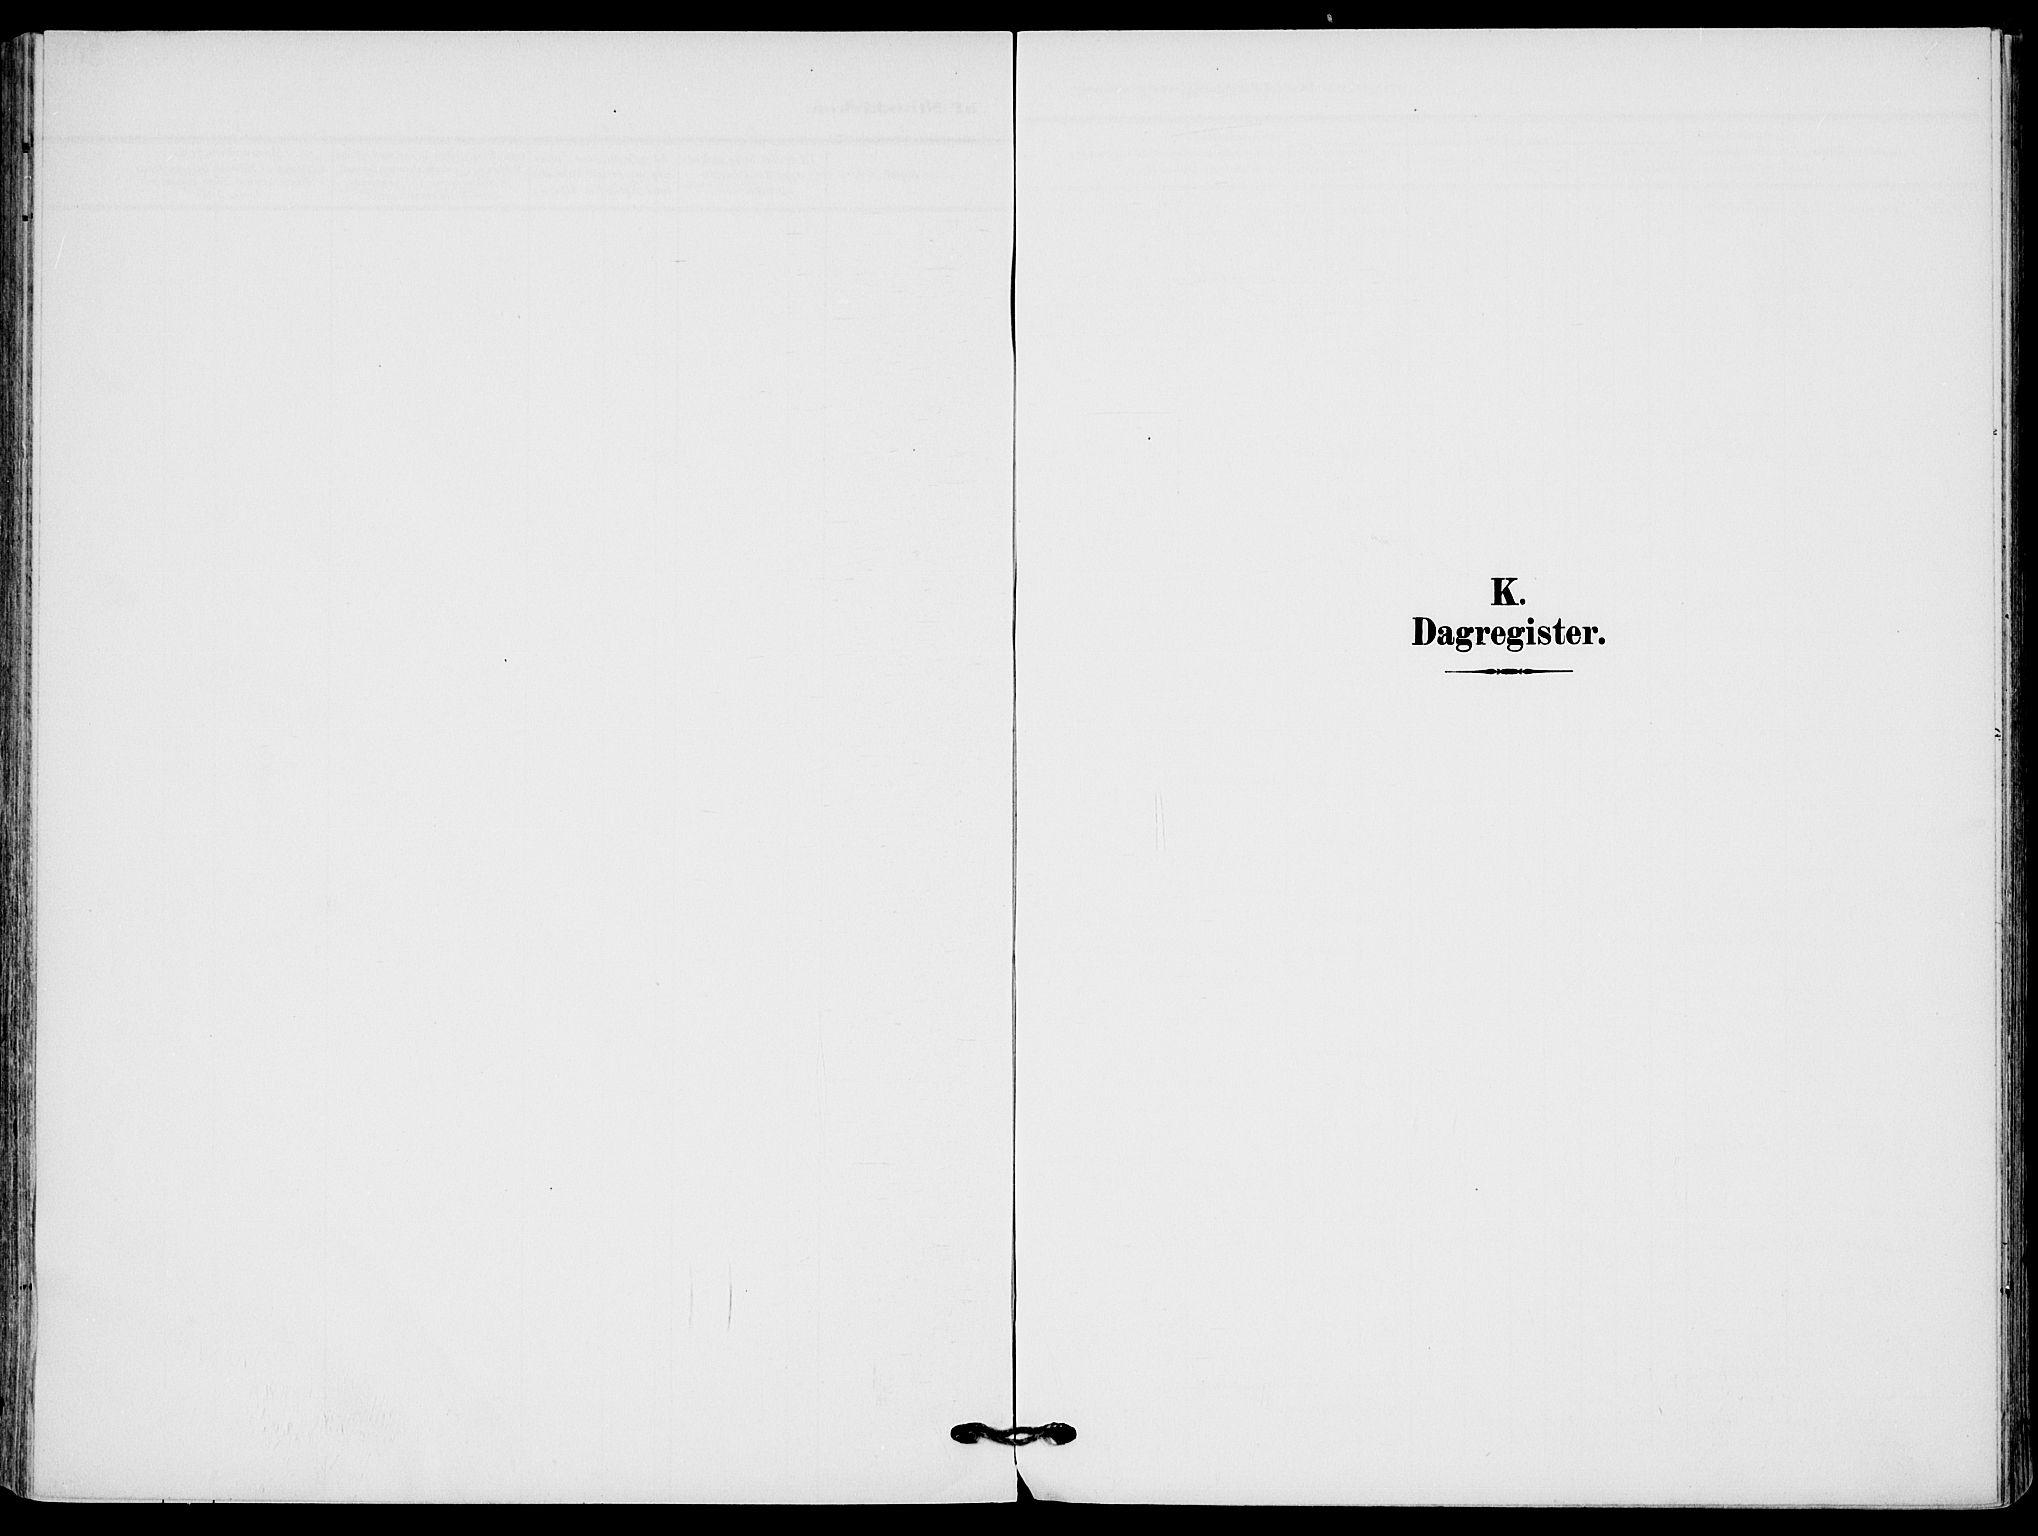 SAKO, Sandefjord kirkebøker, F/Fa/L0005: Parish register (official) no. 5, 1906-1915